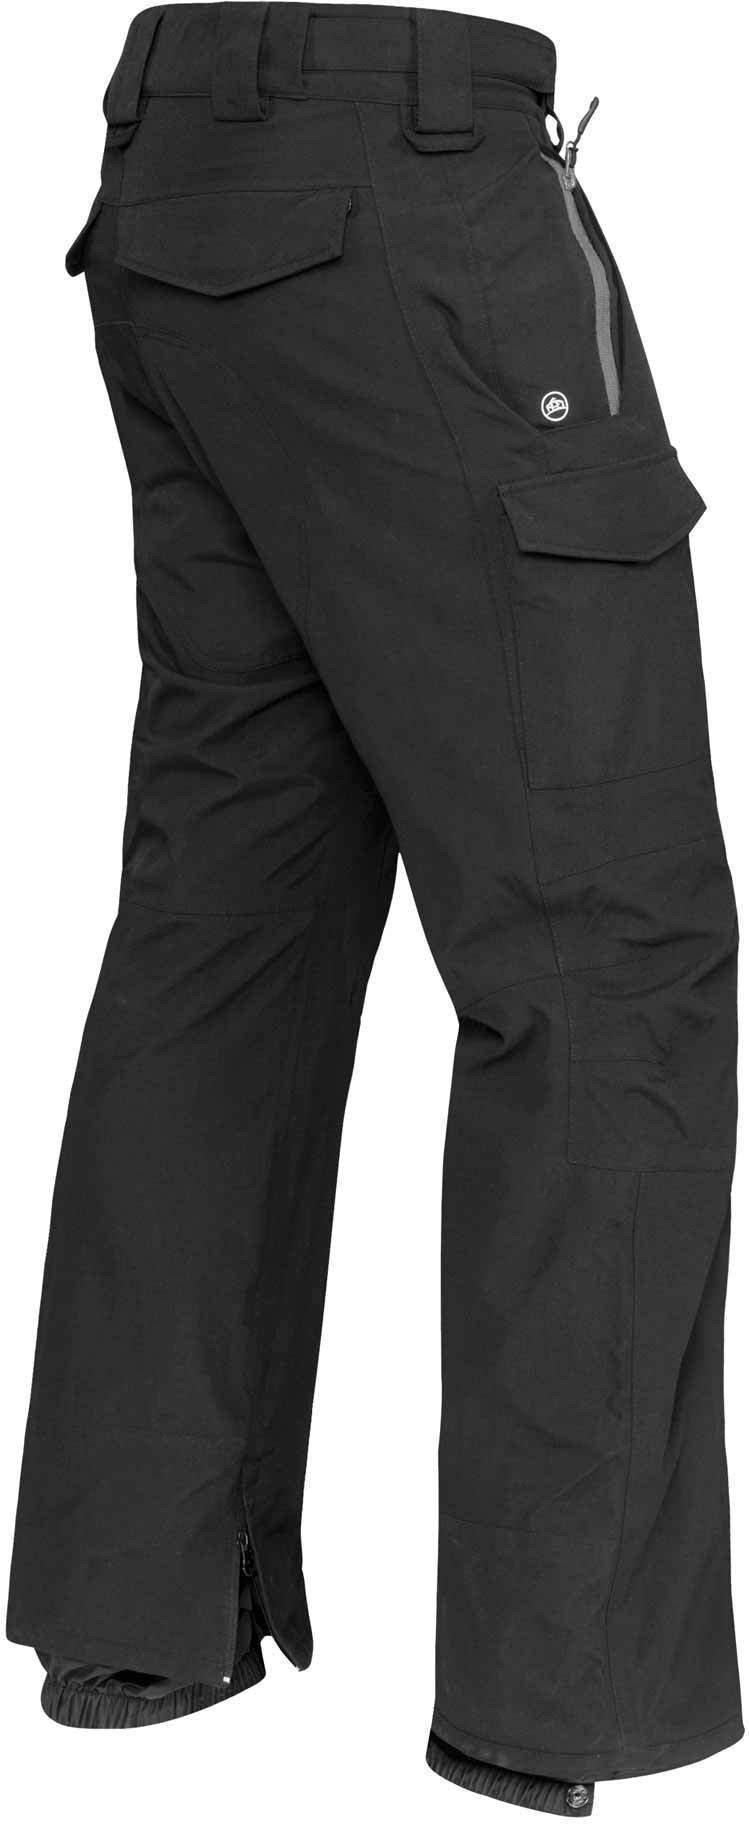 WTSTEP-2 - Granite & Black - WorkwearToronto.com Men's Custom Decorated Hard Shell Pants - Custom Clothing in GTA